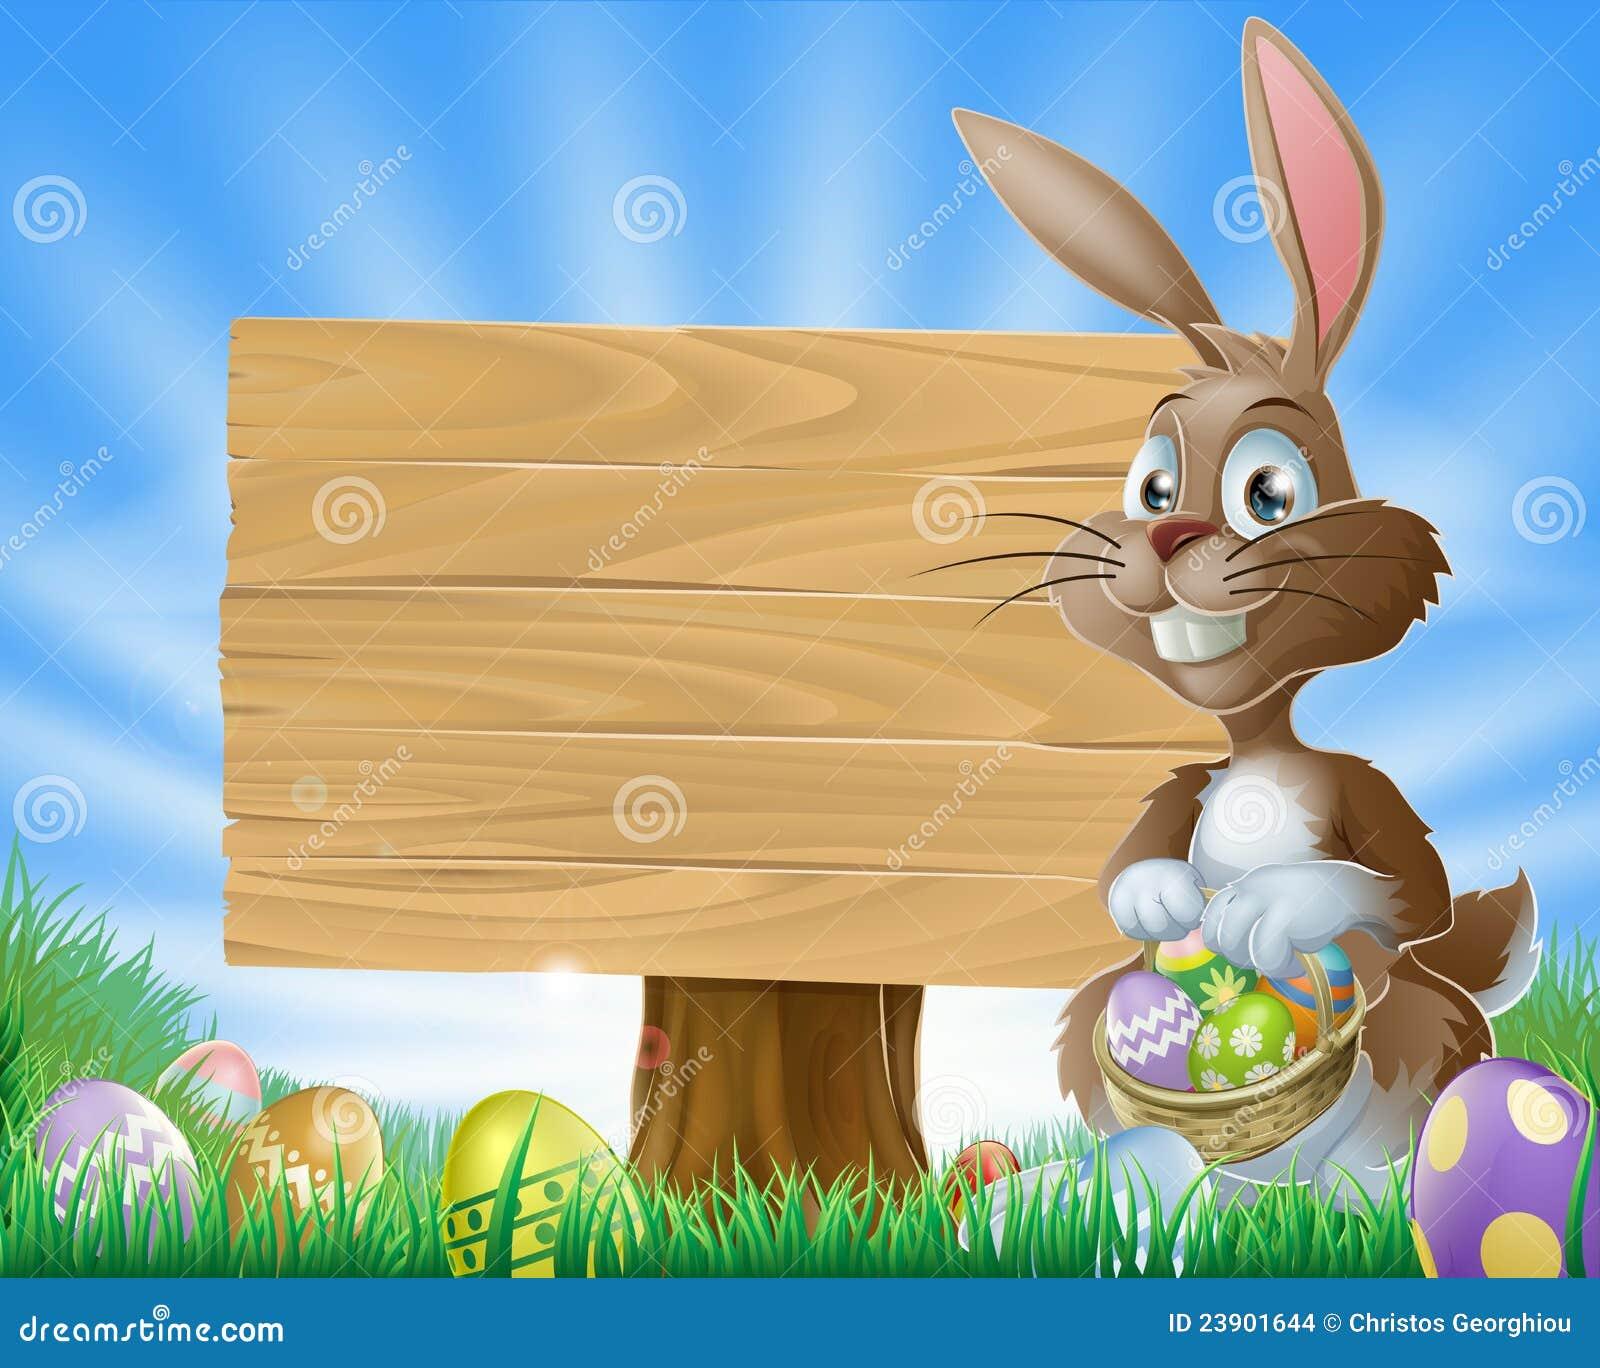 Easter Bunny Rabbit Background Stock Vector - Illustration ...